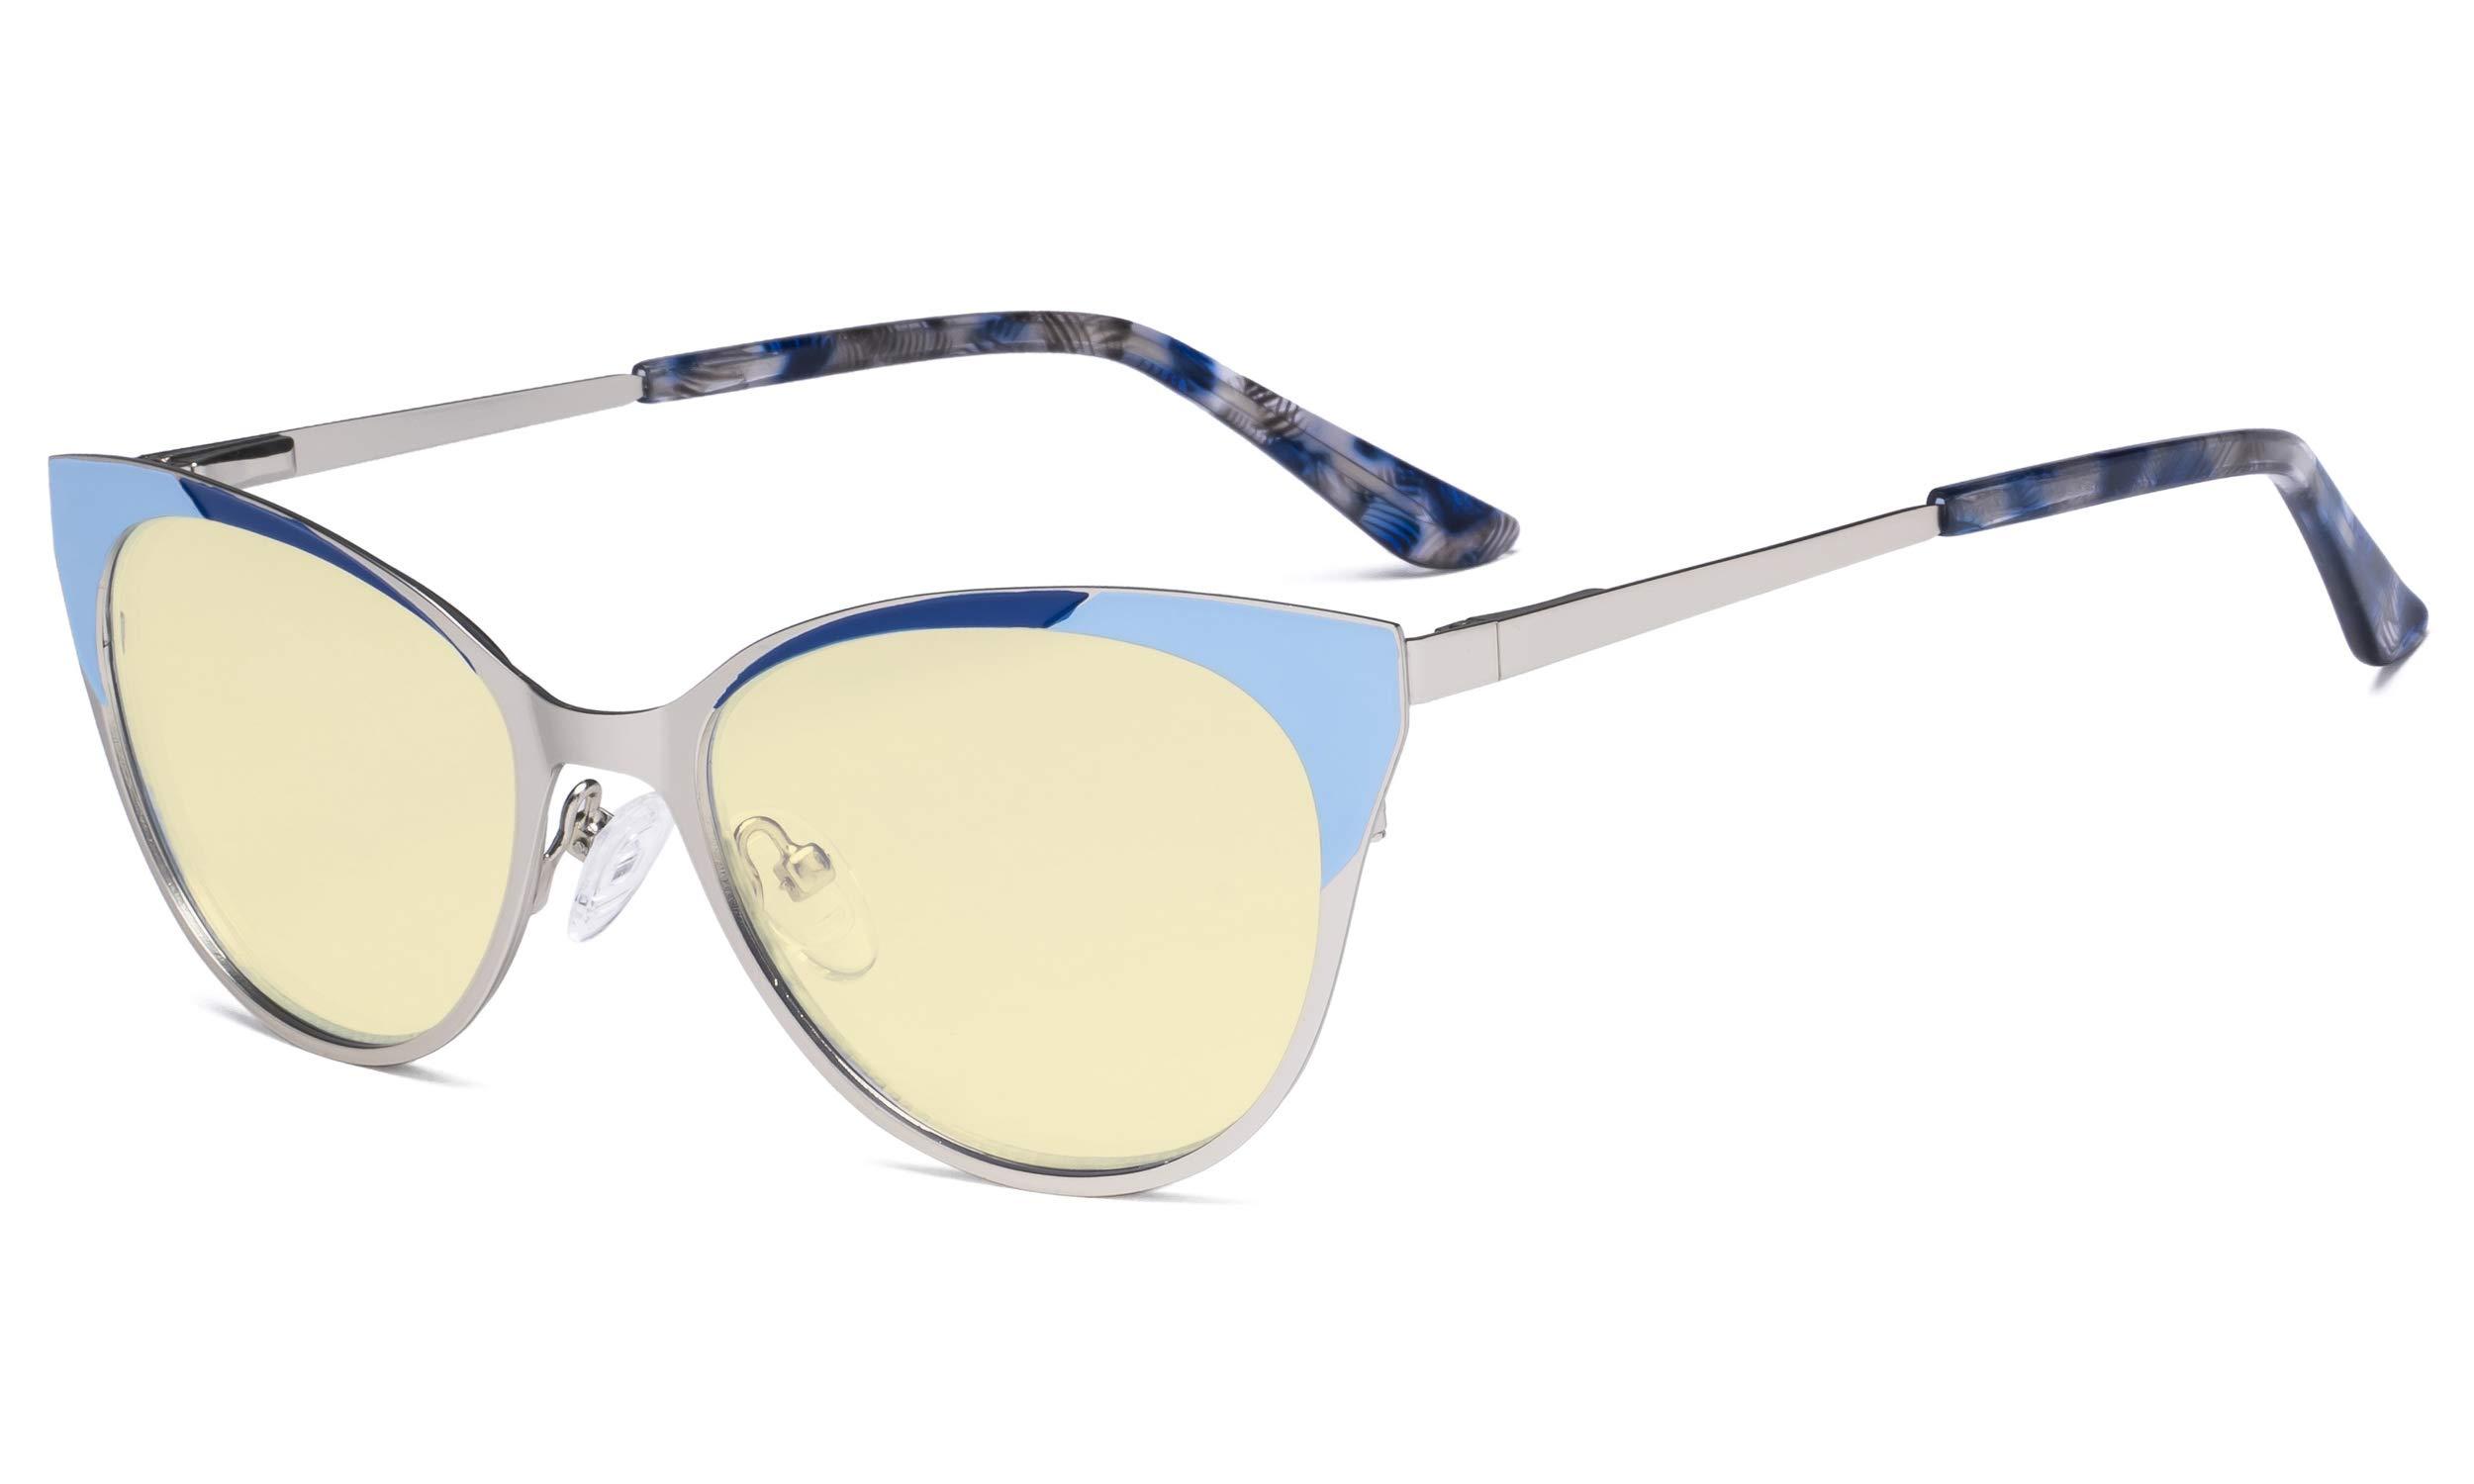 Eyekepper Ladies Blue Light Blocking Glasses - Butterfly Design Computer Eyegalsses Women Anti Screen UV Rays - Cut Digital Glare Yellow Filter Lens Reduce Eye Strain - Silver